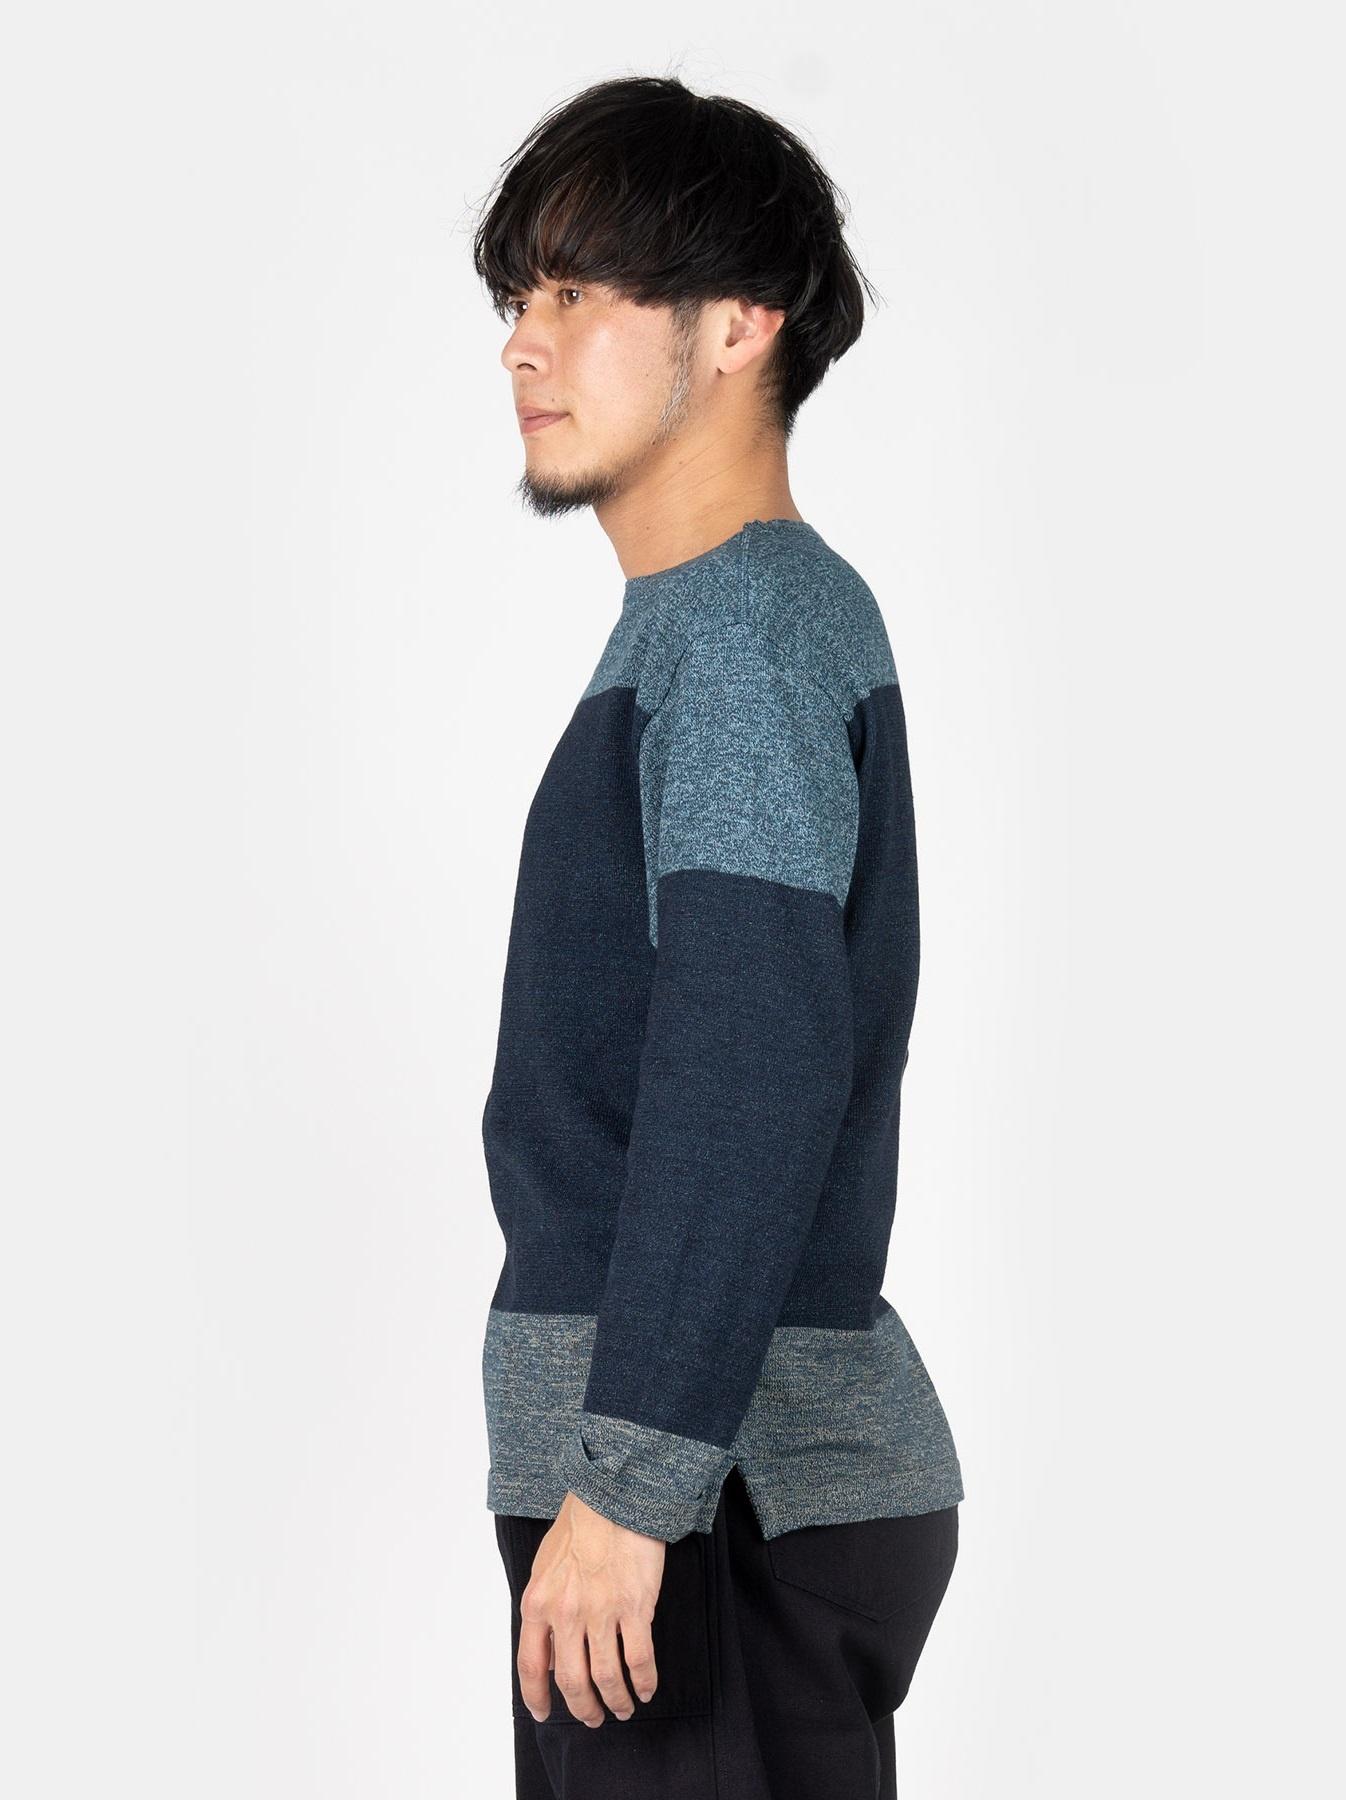 WH Gauze Basque Knit T-shirt-4